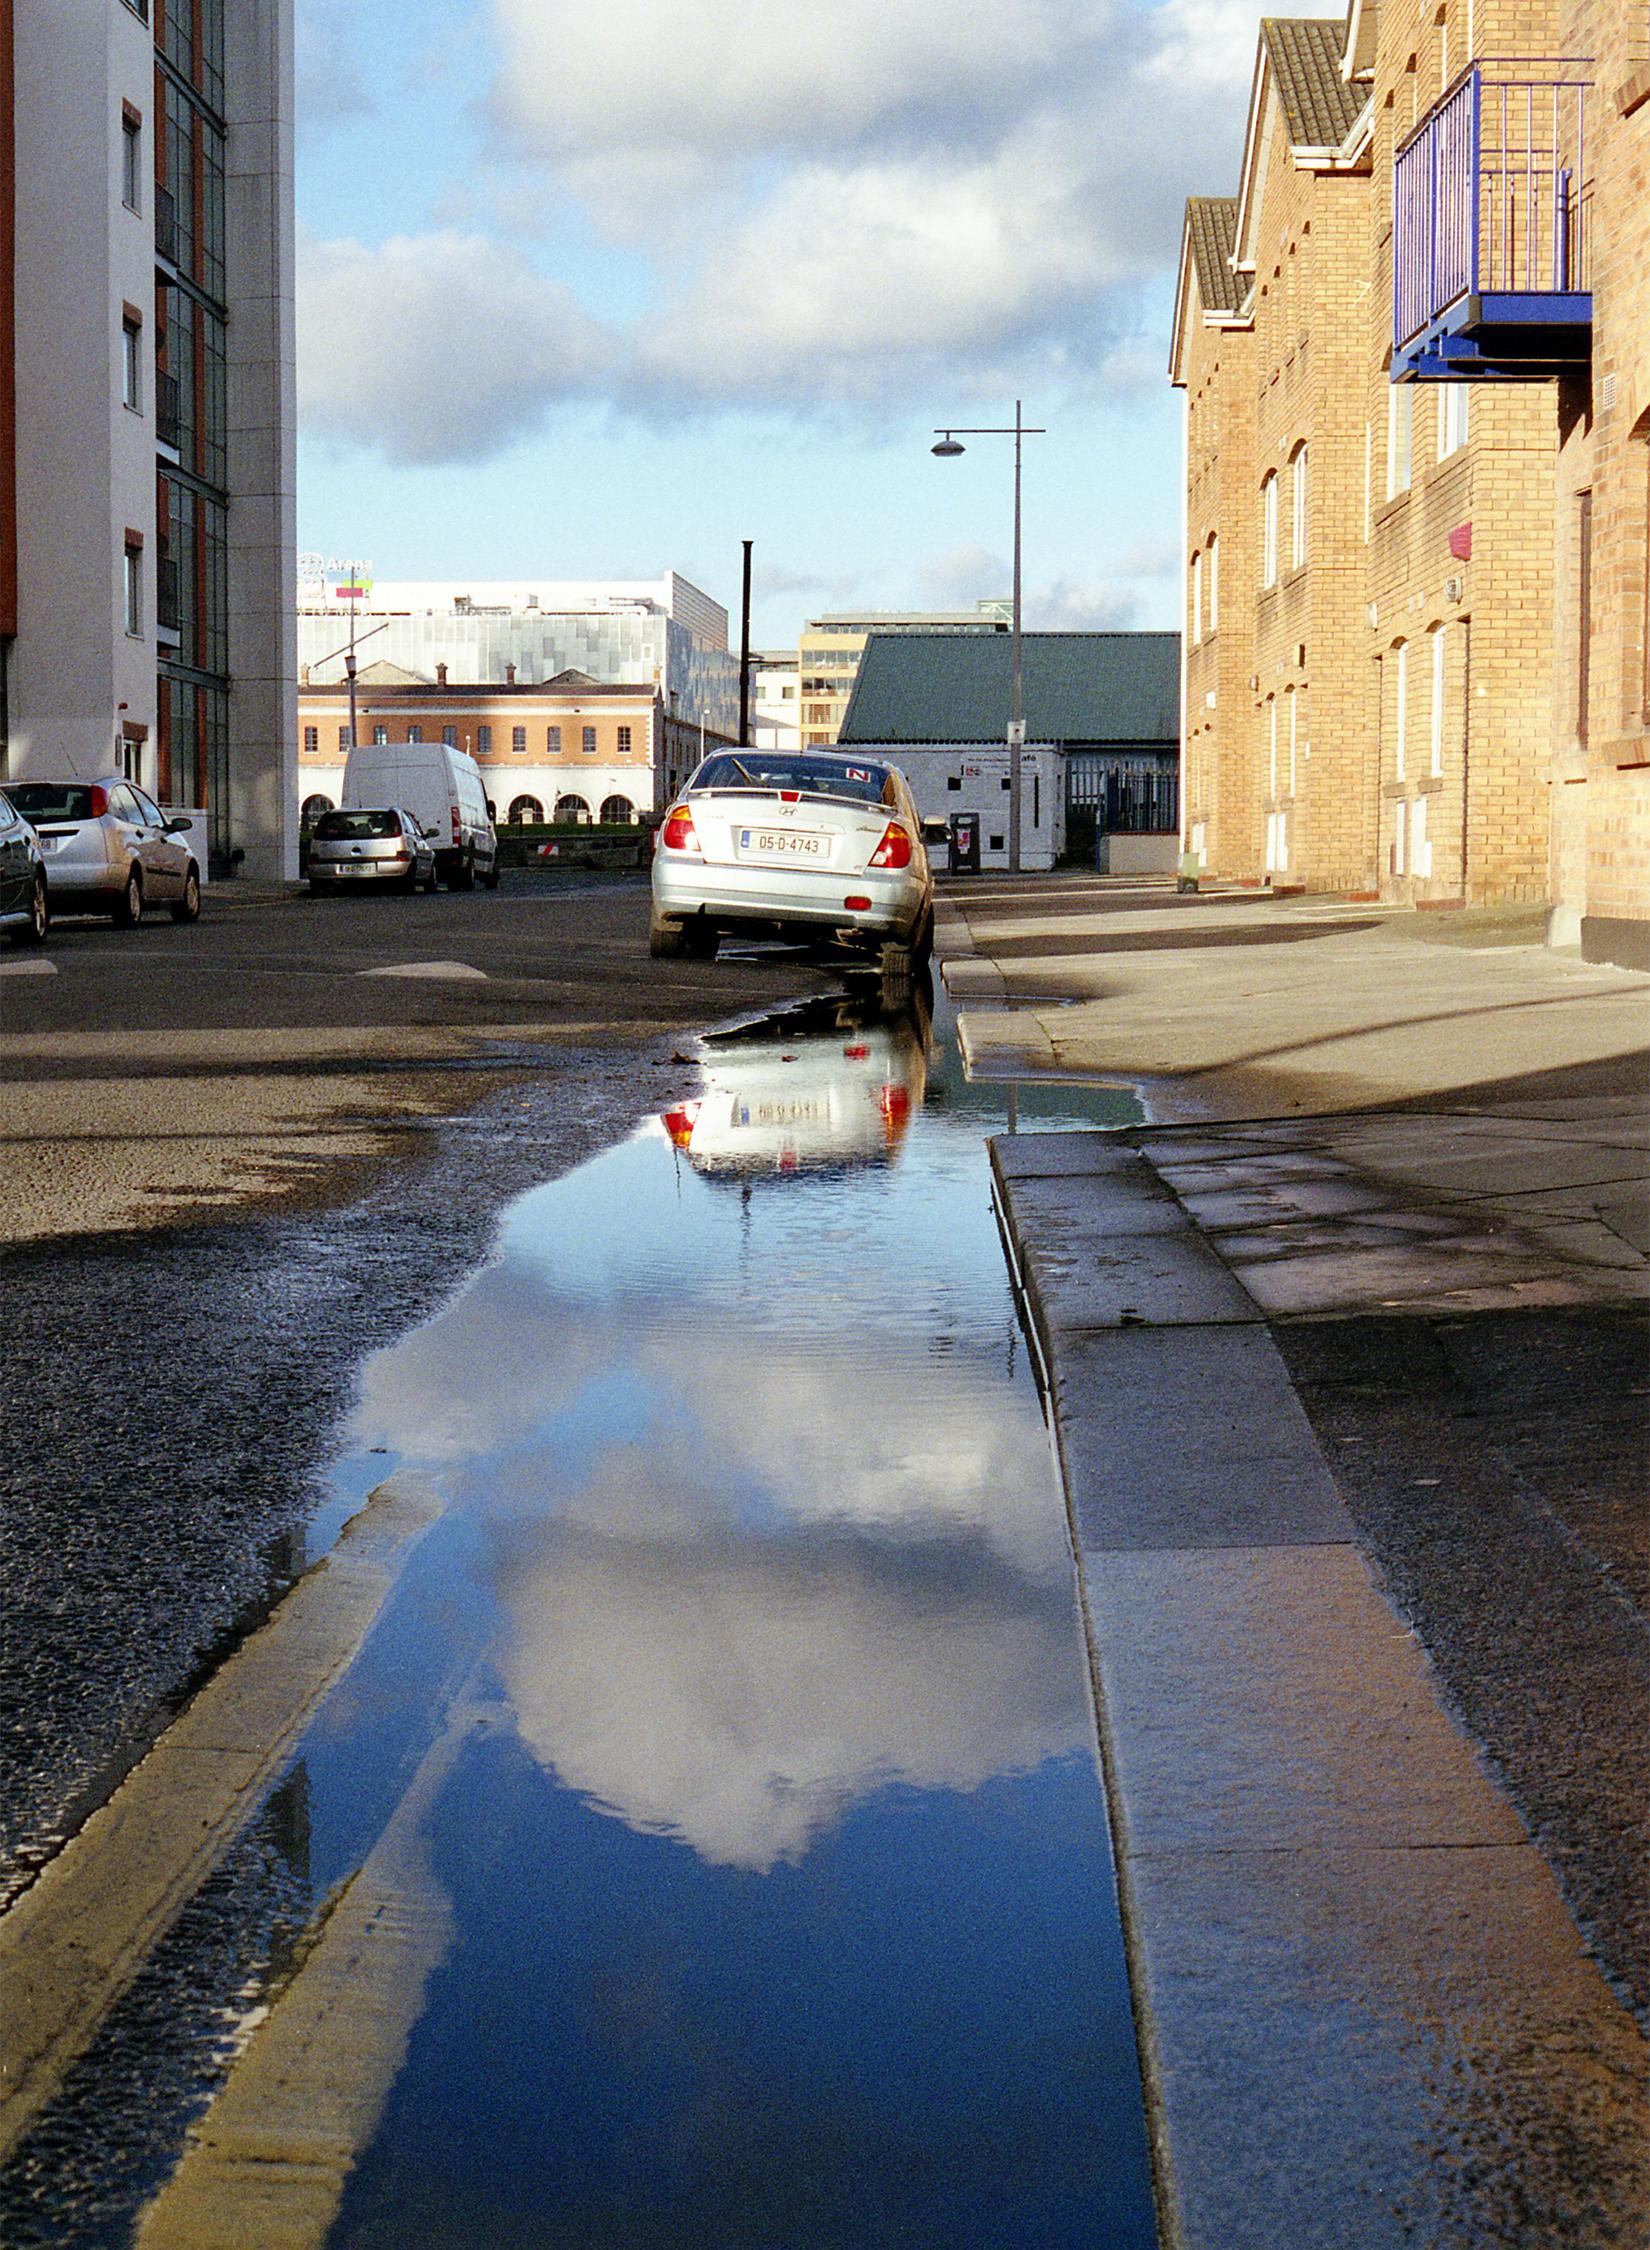 25 car puddle copy.jpg